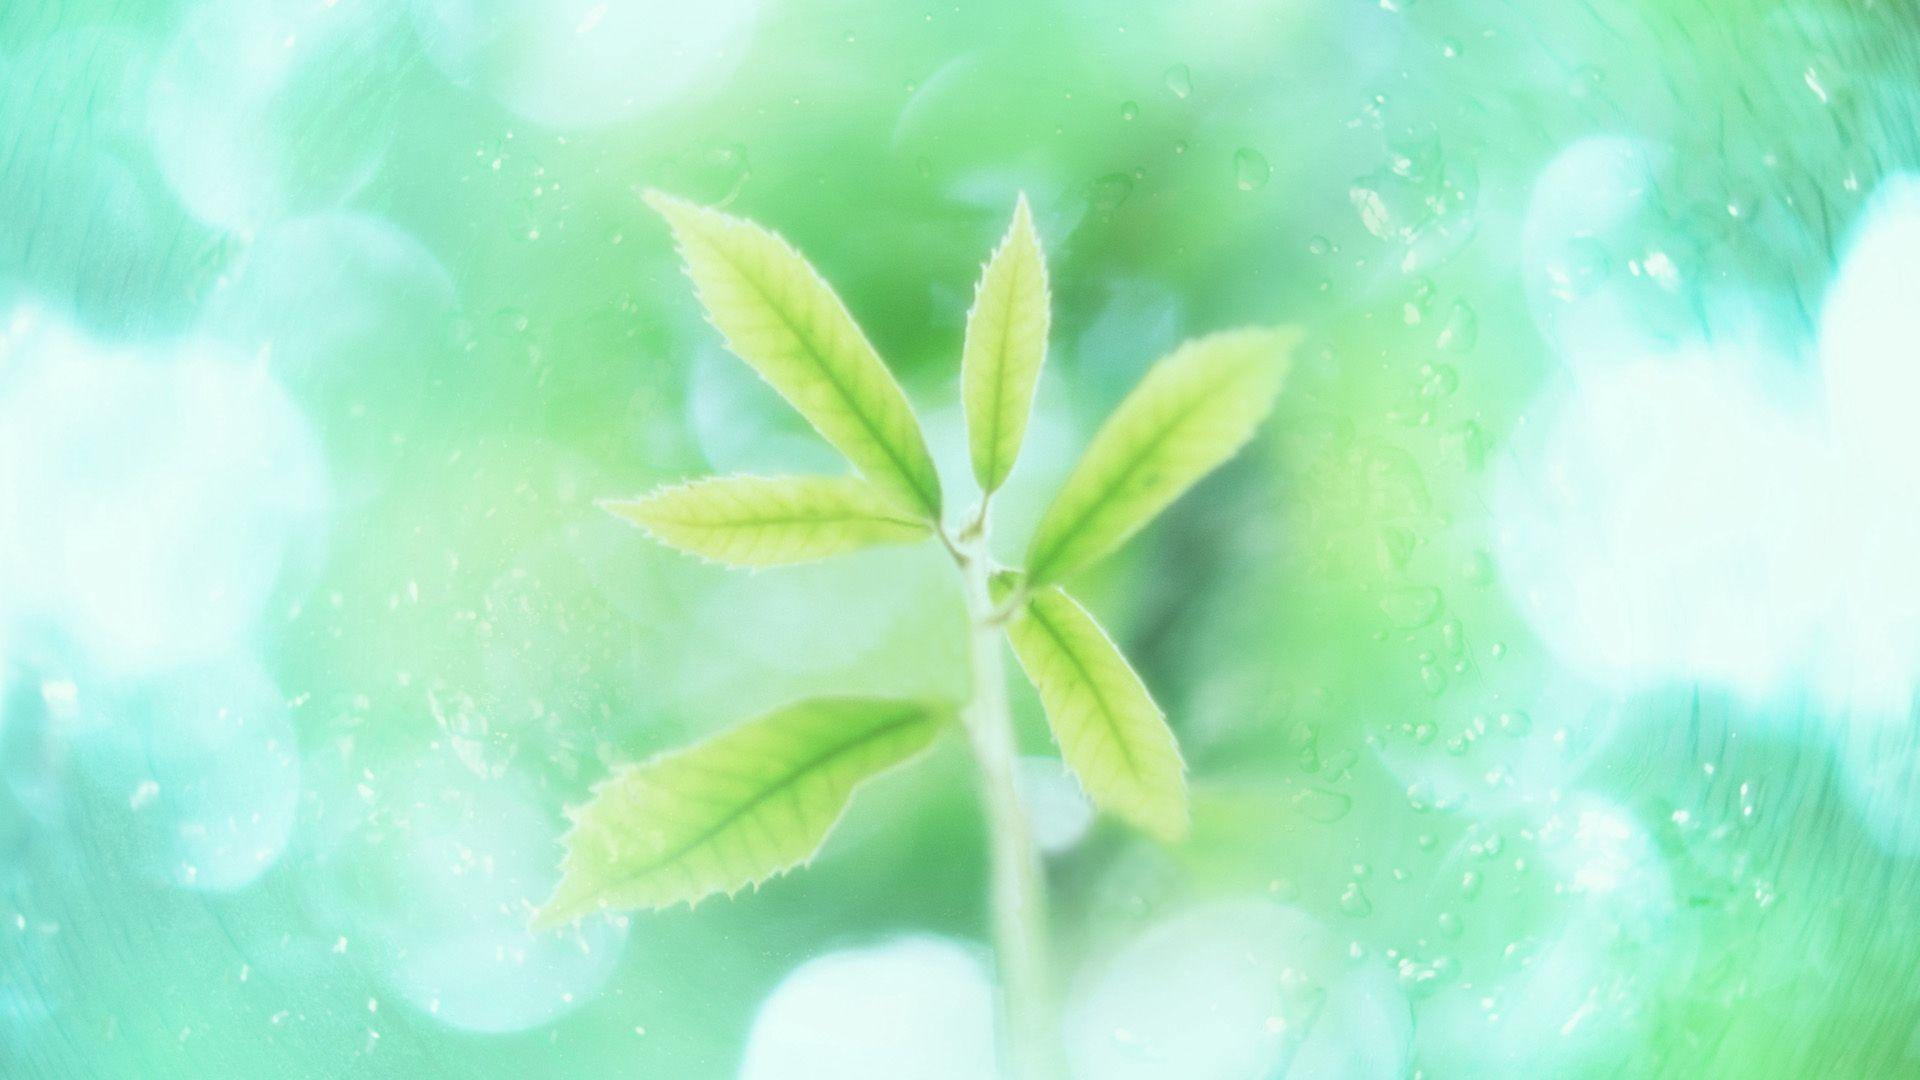 Mint Green free download wallpaper